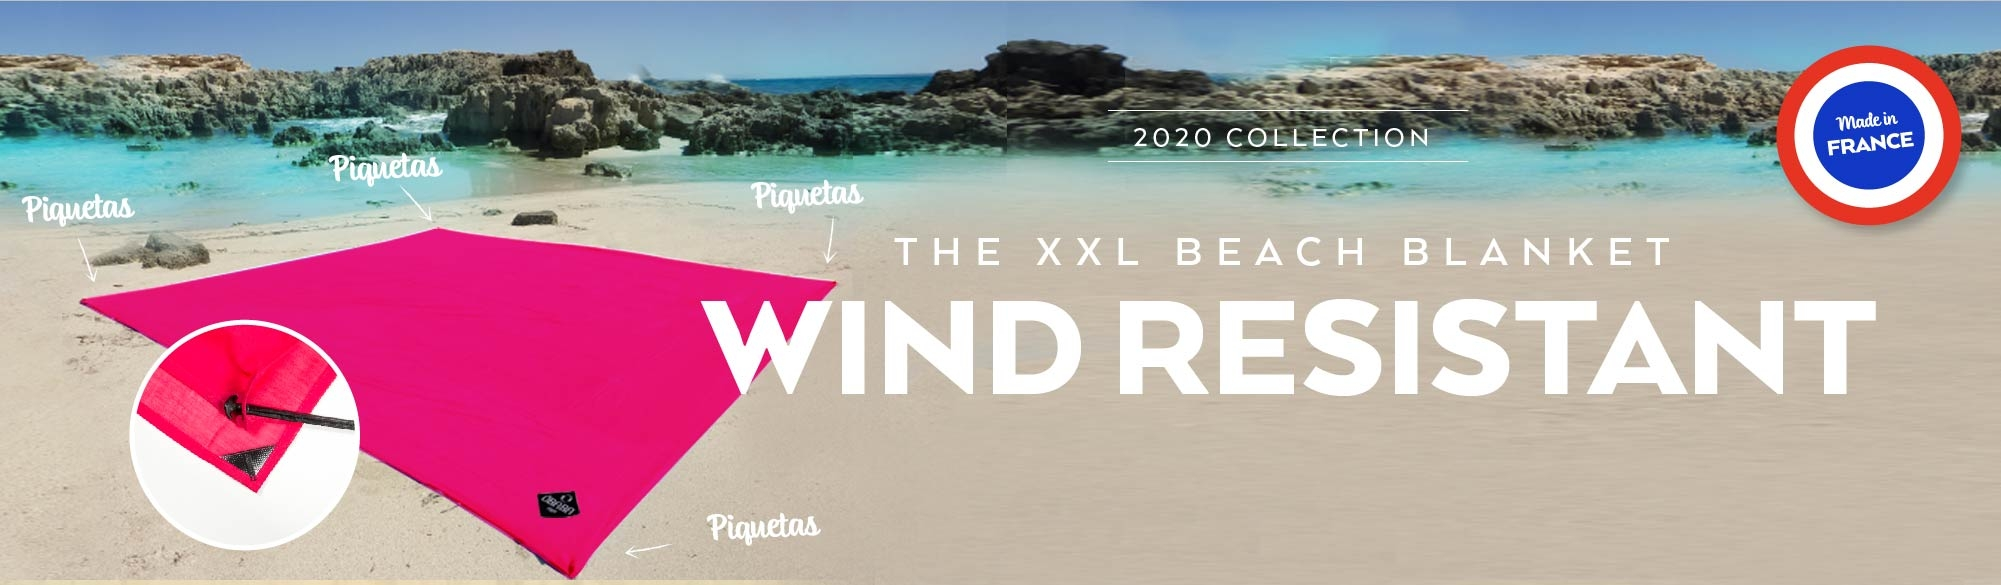 The wind resistant beach blanket